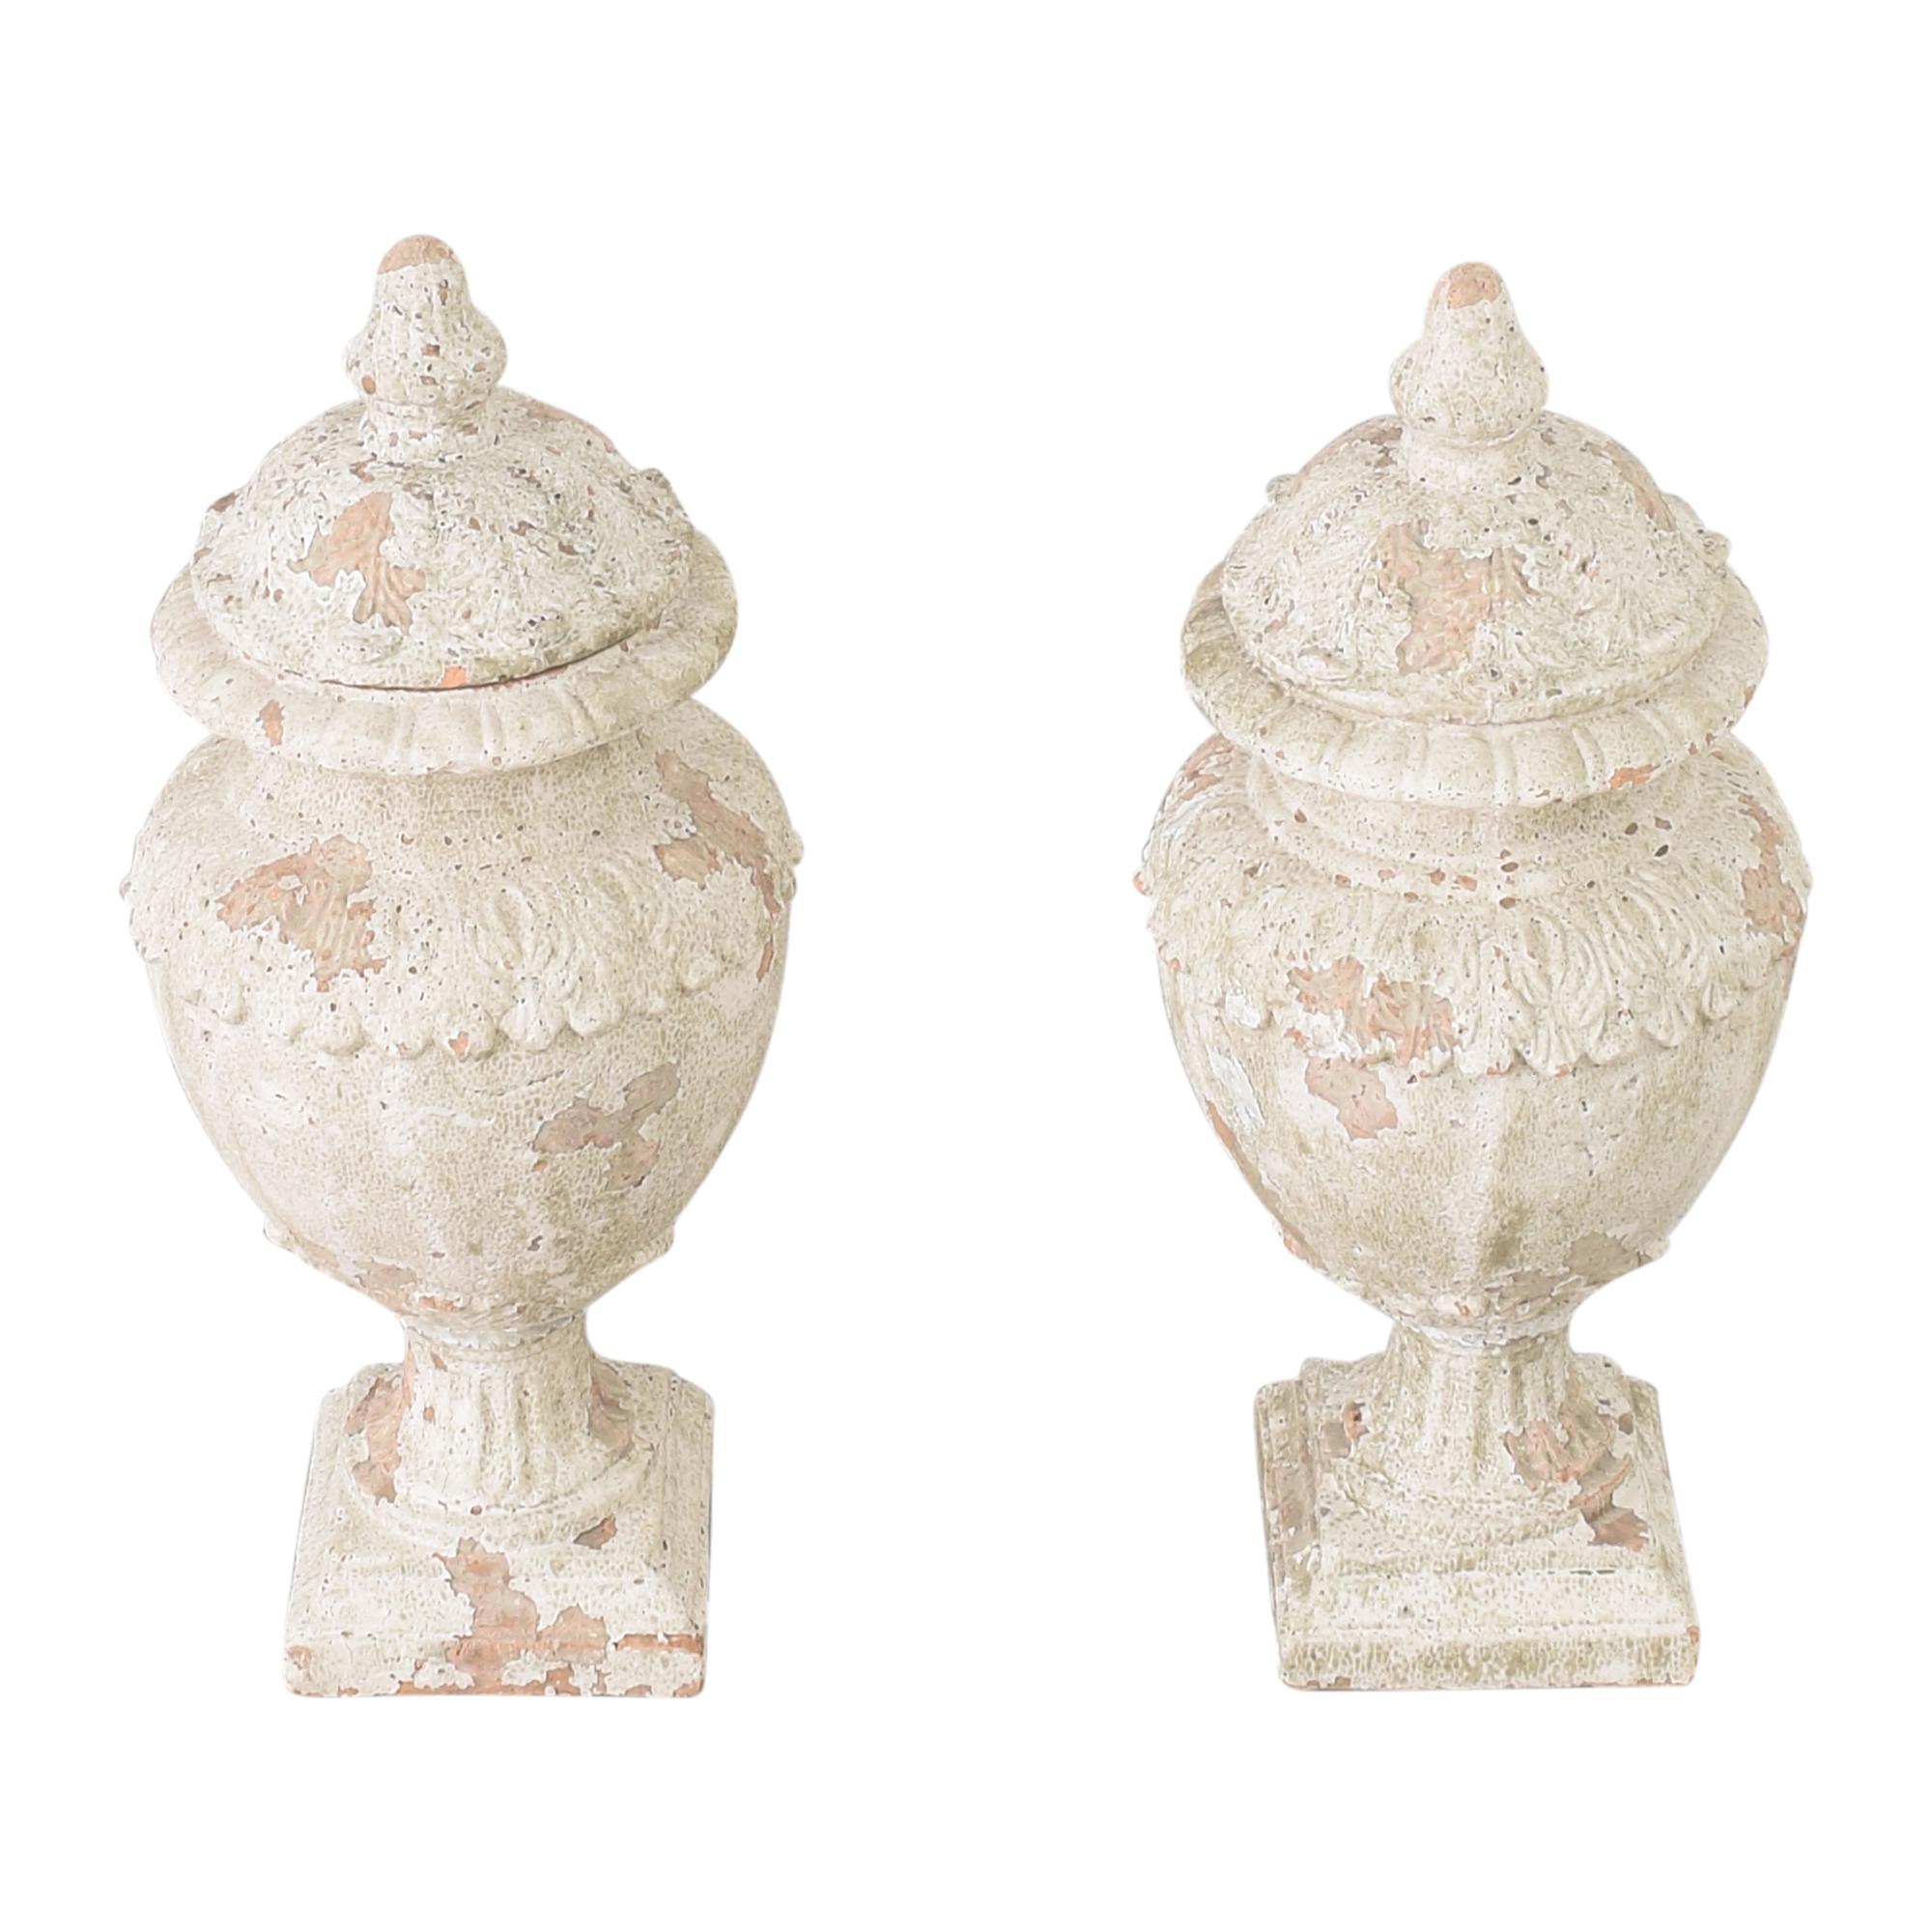 Decorative Distressed Urns Decor